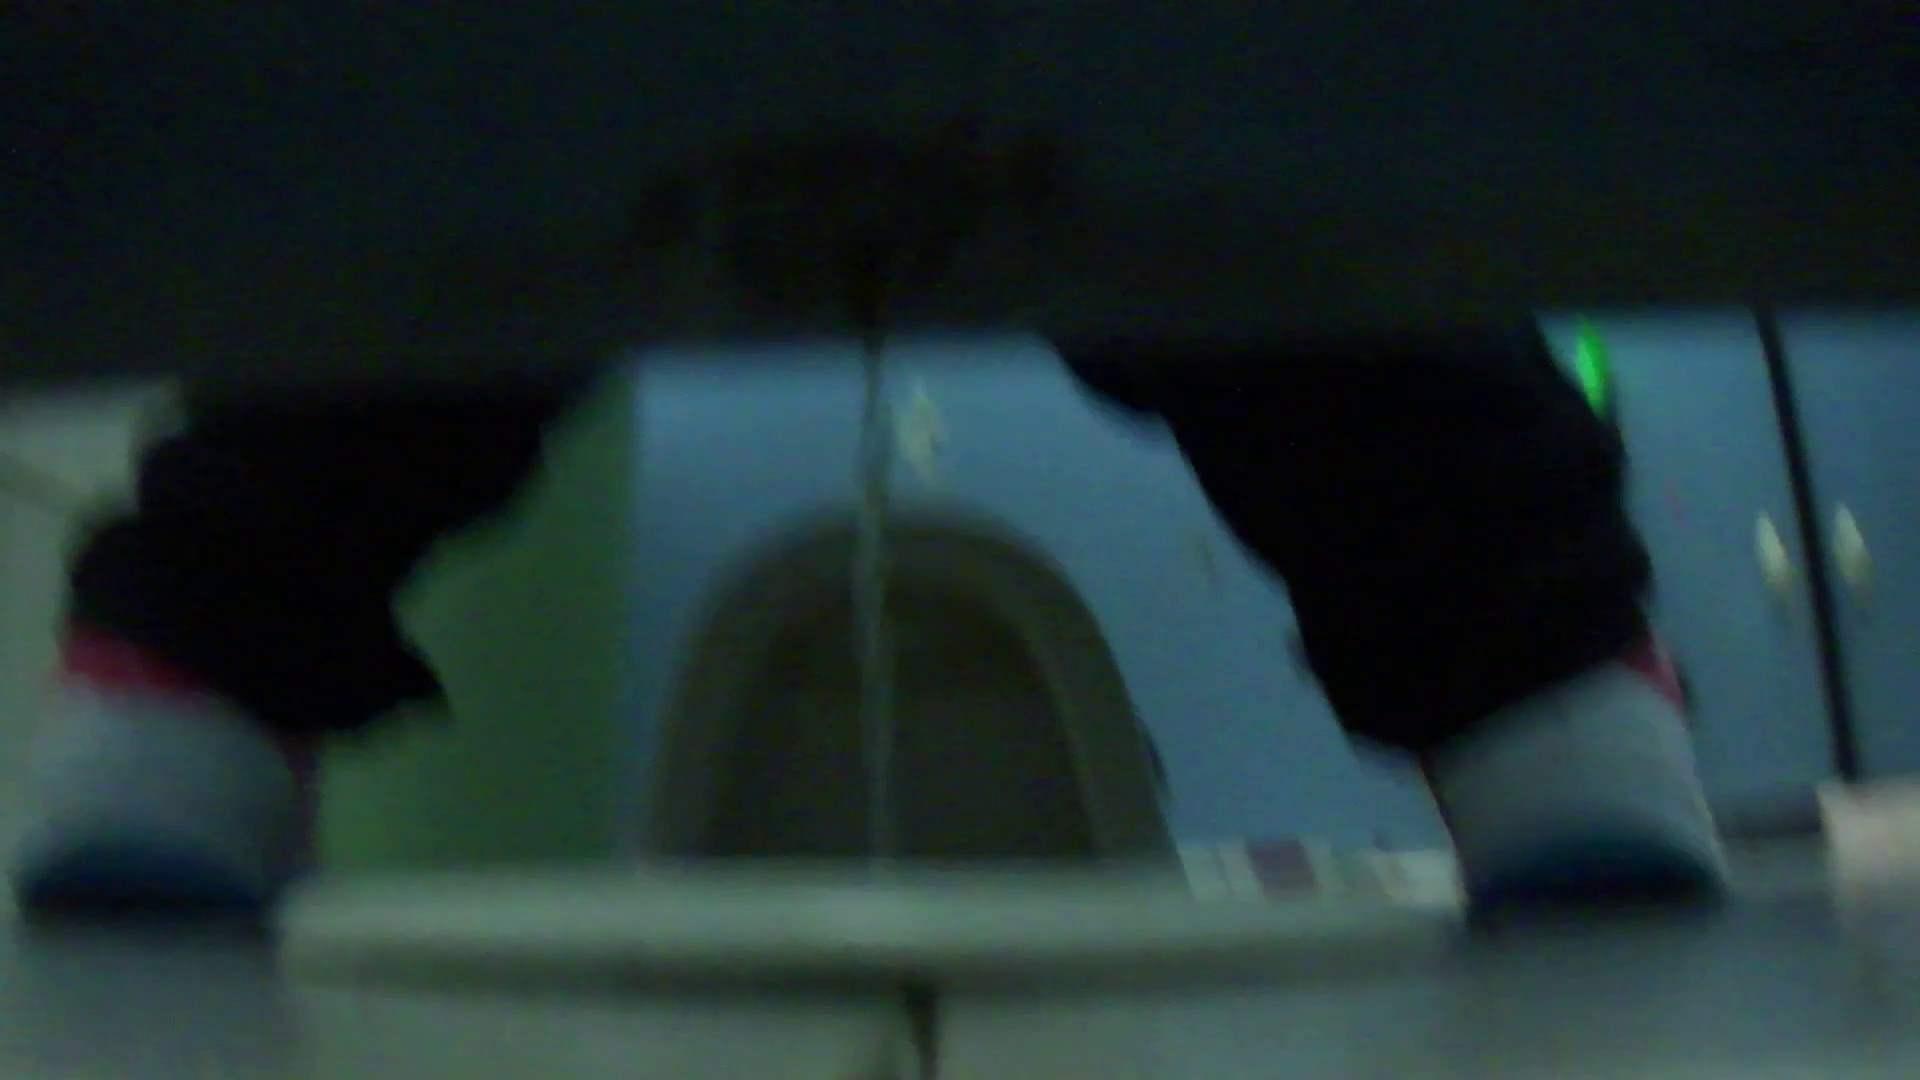 JD盗撮 美女の洗面所の秘密 Vol.76 盗撮 AV無料動画キャプチャ 64PIX 7